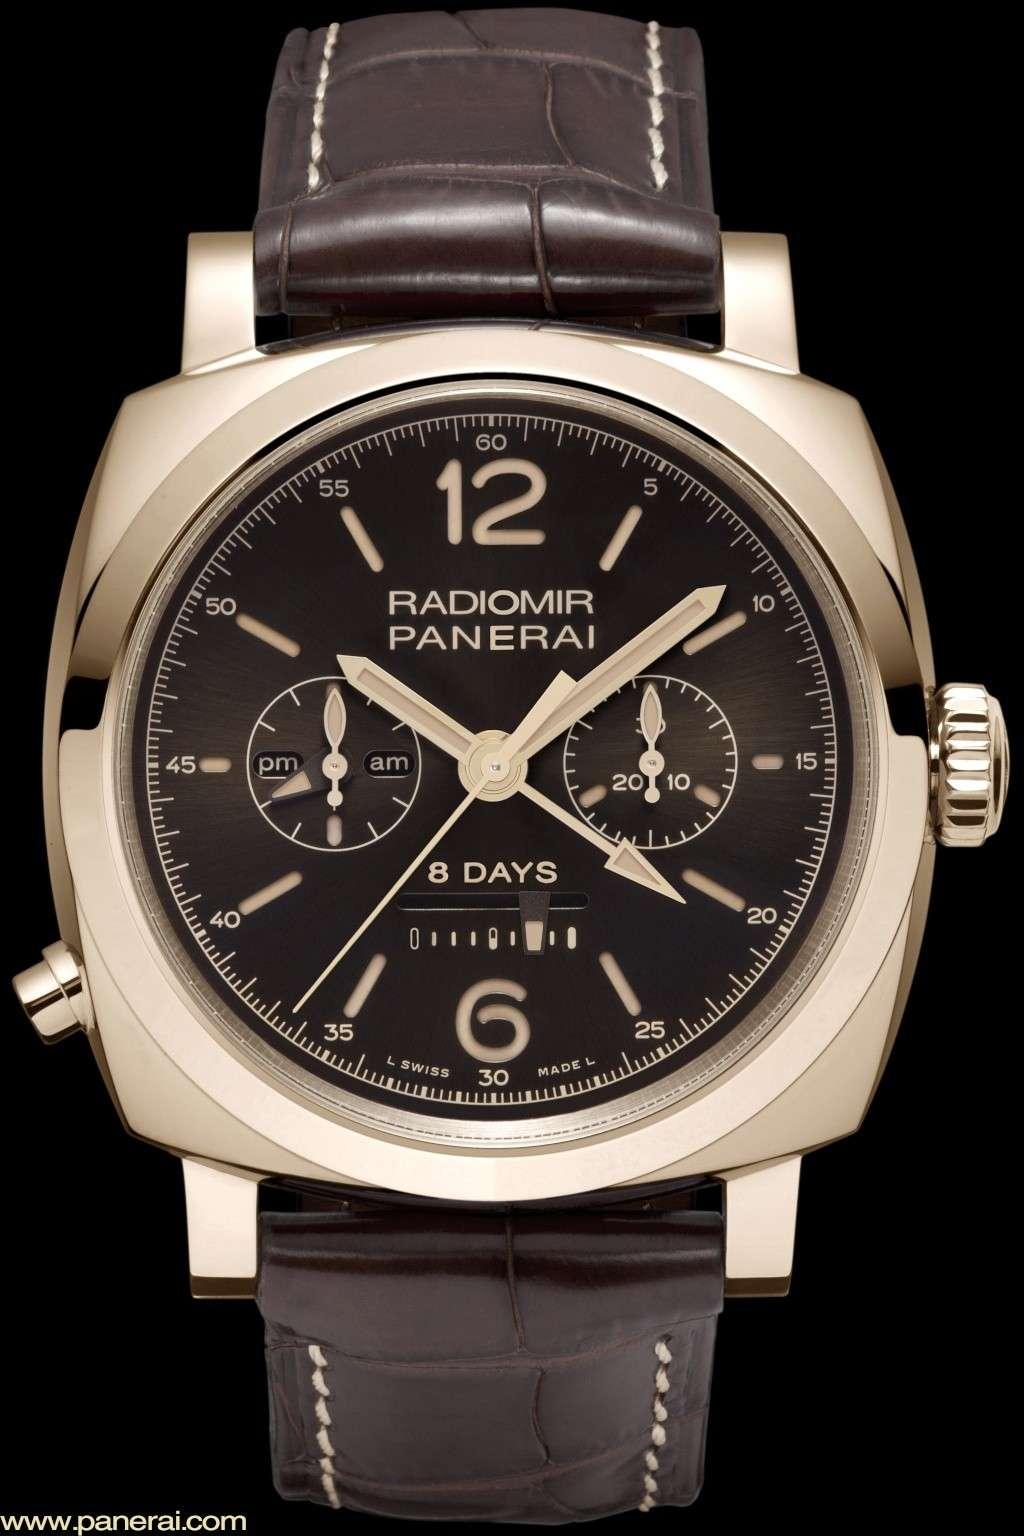 Communiqué de Presse : RADIOMIR 1940 CHRONO MONOPULSANTE 8 DAYS GMT ORO ROSSO – 45mm - PAM00502 Pam50215